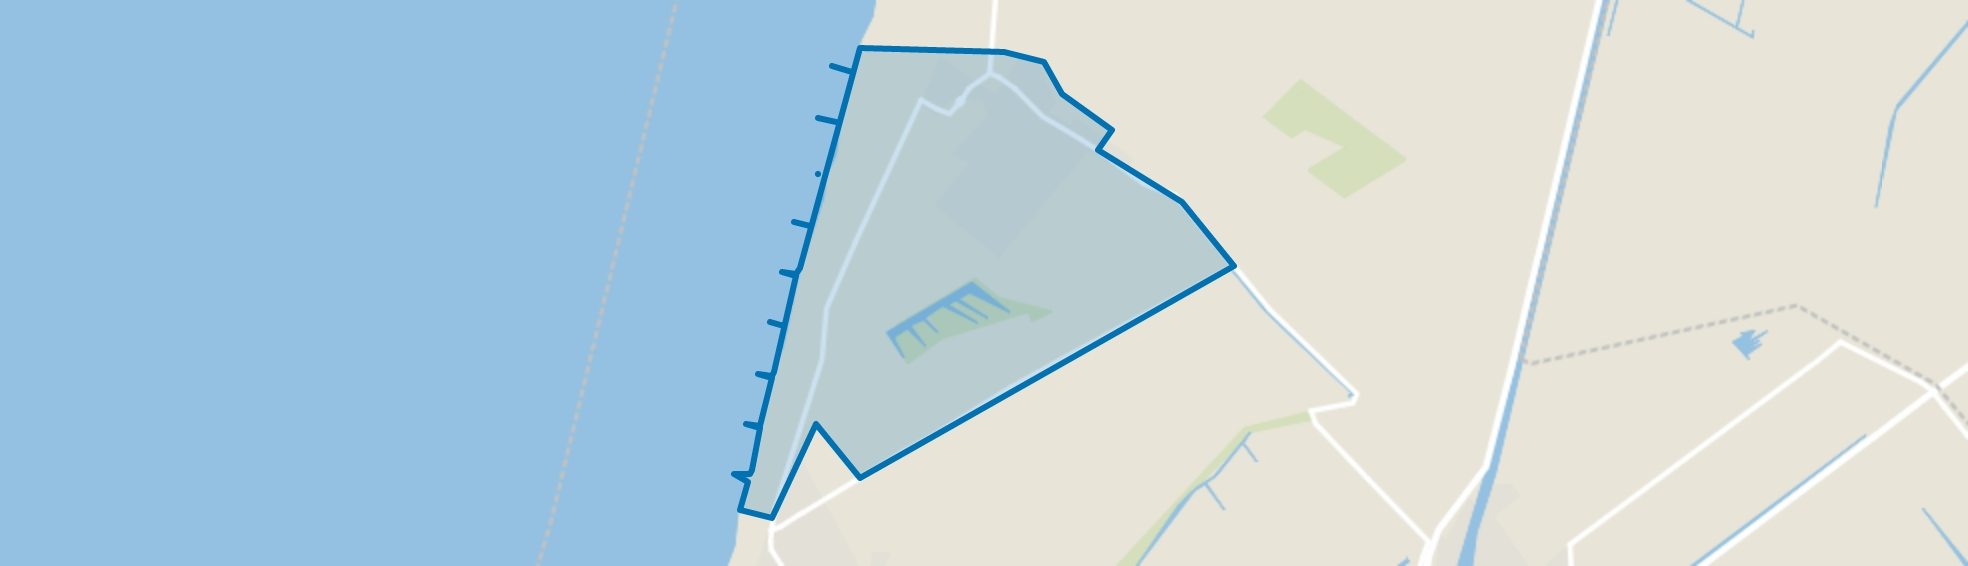 Groote Keeten, Abbestede en Buitengebied, Callantsoog map